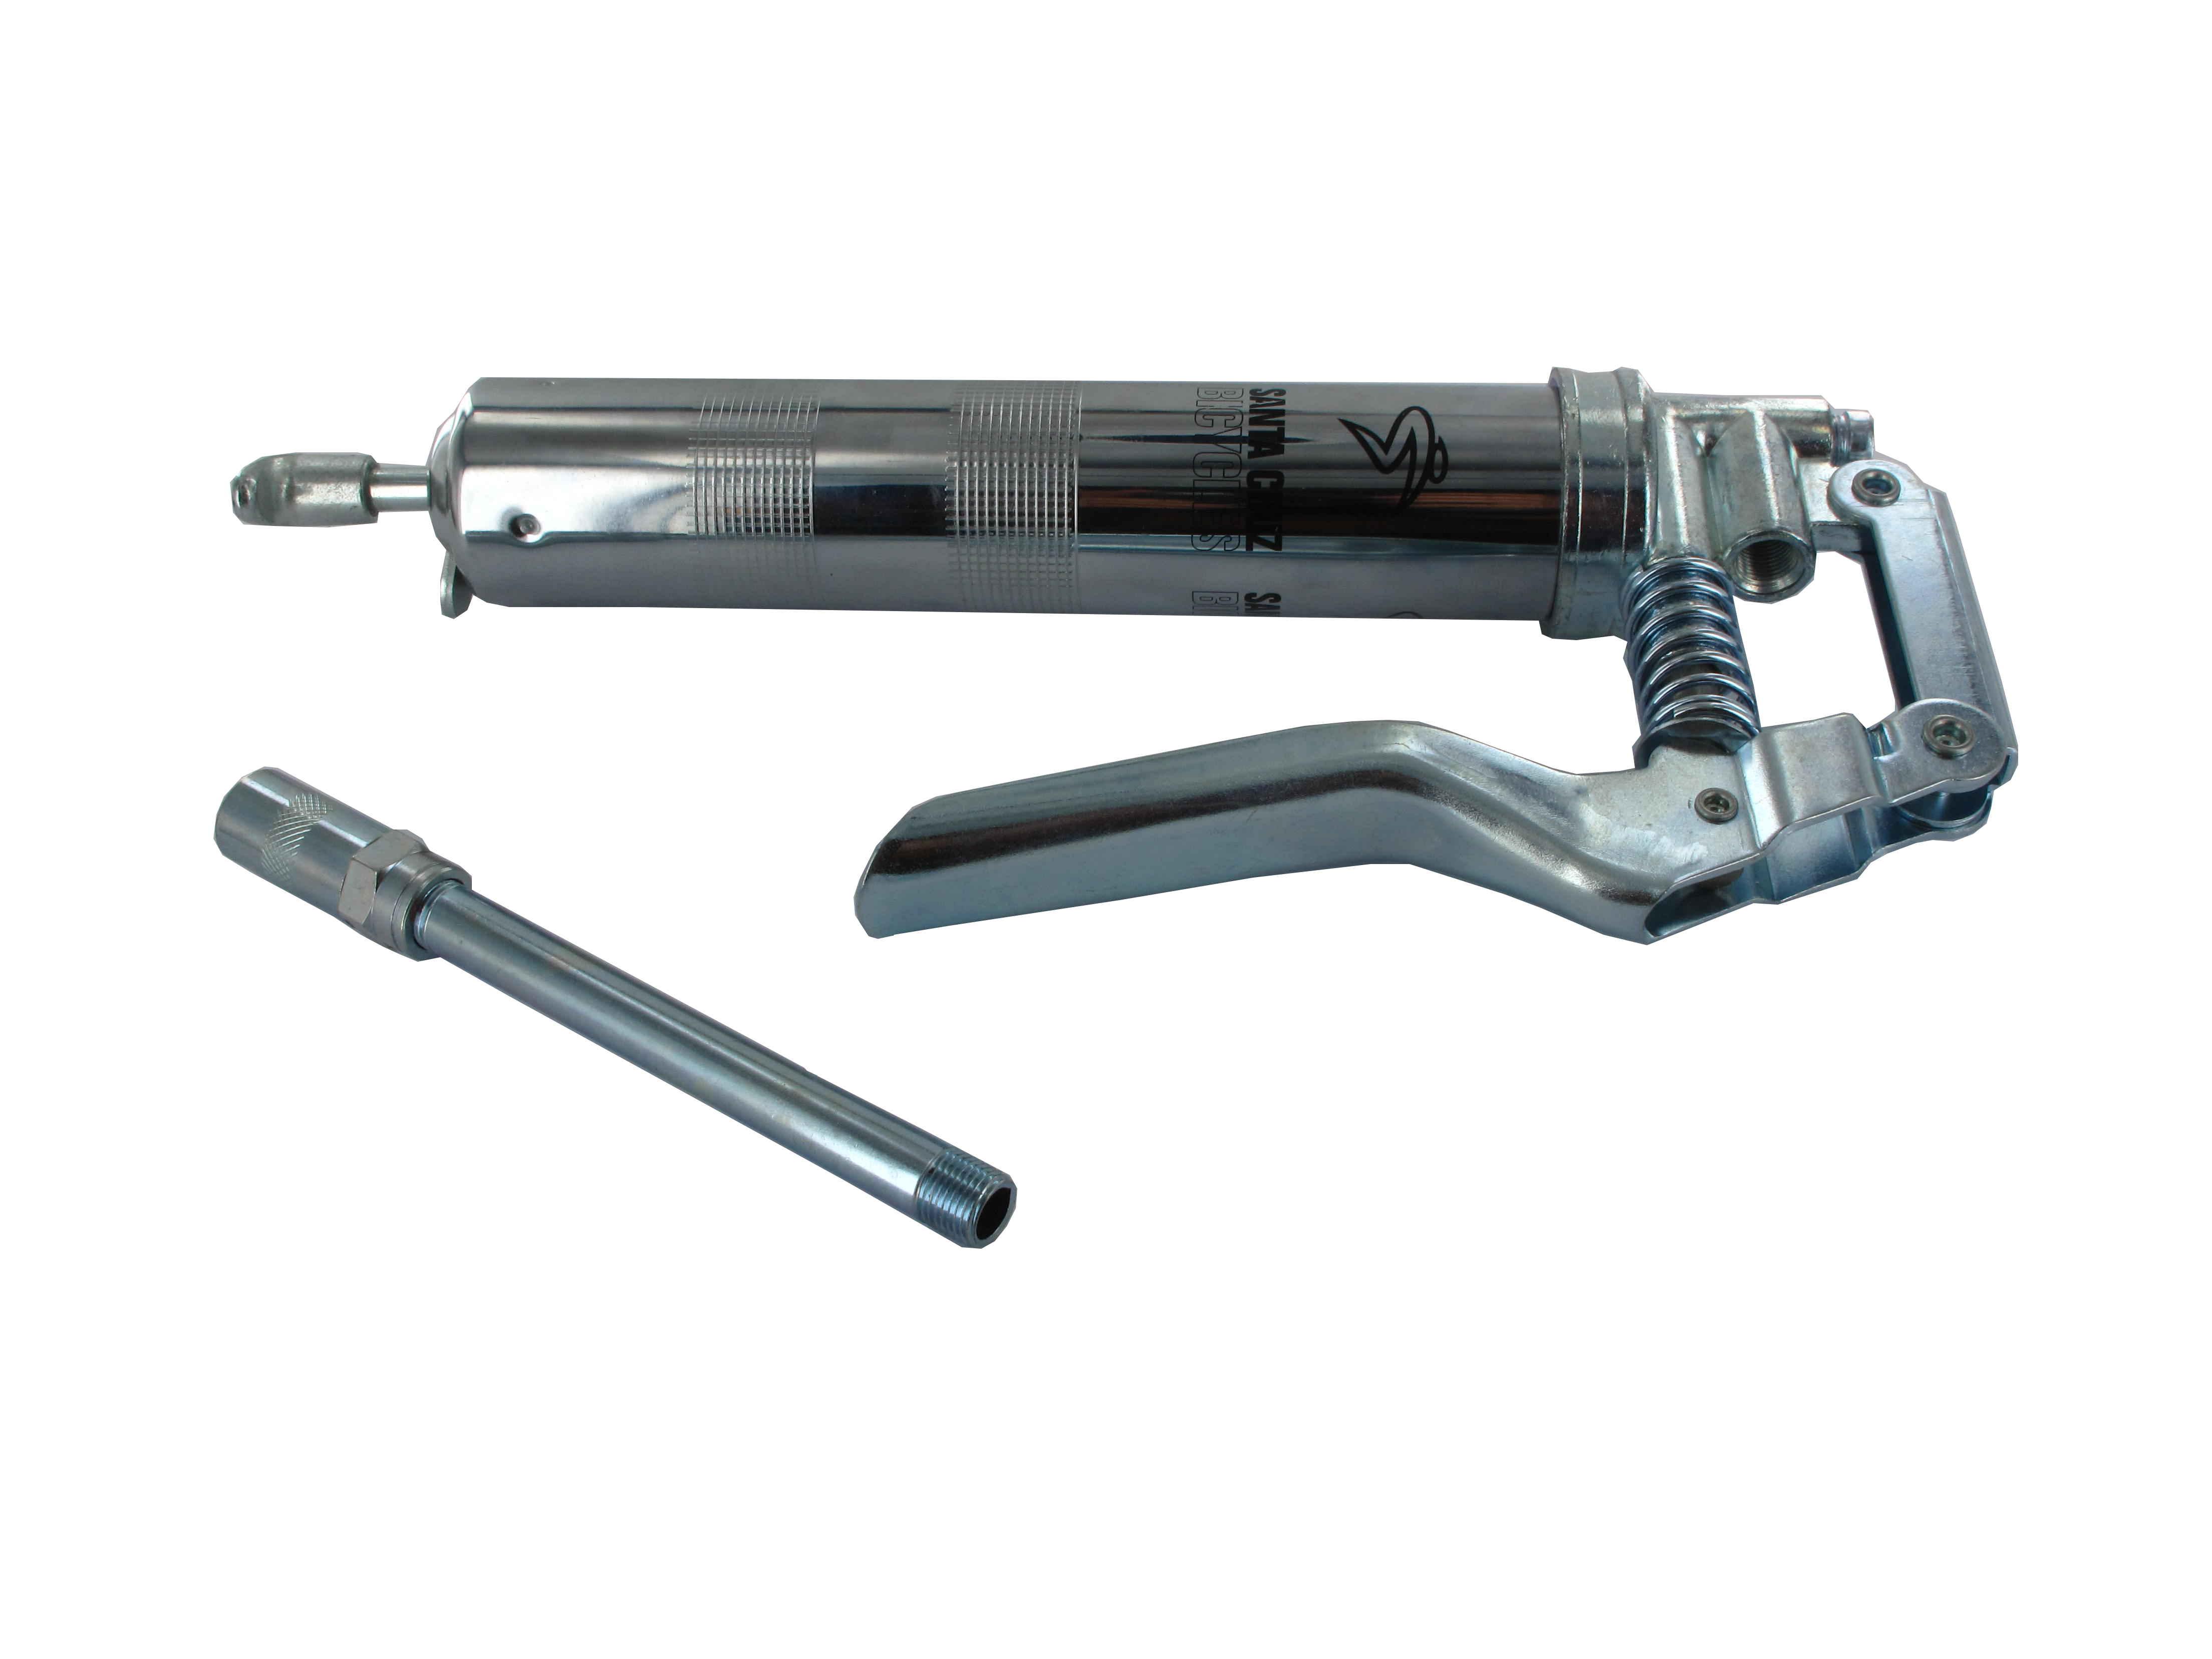 santa cruz pistolet graisse pour cadre v lo neuf 40 zk. Black Bedroom Furniture Sets. Home Design Ideas